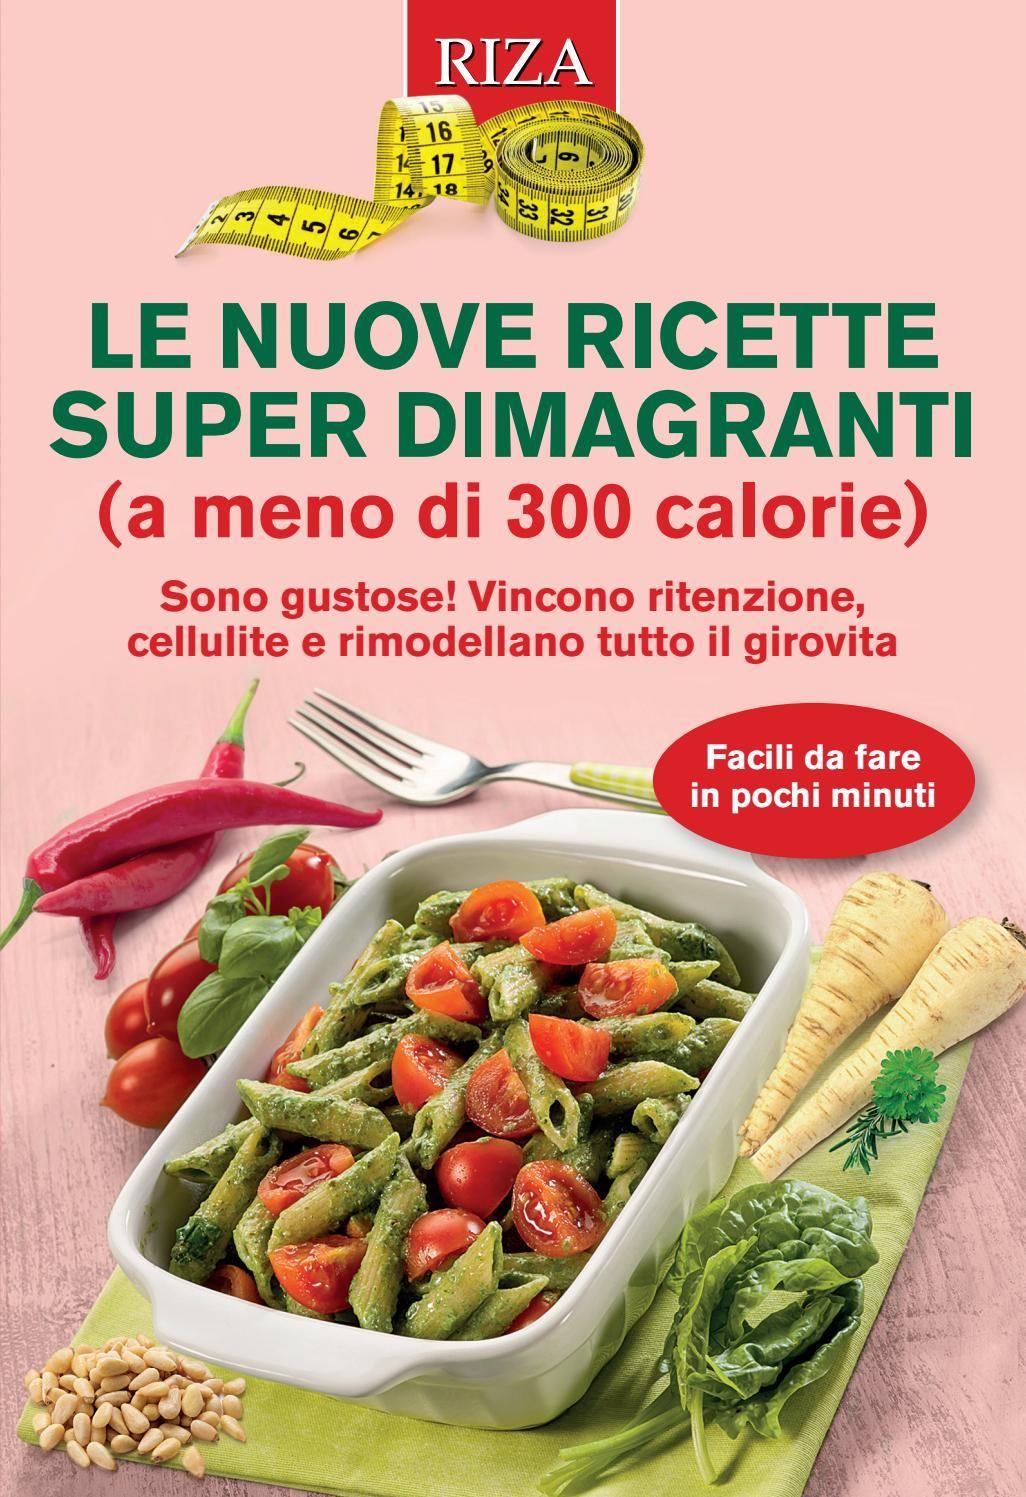 ricette dimagranti dieta vegana